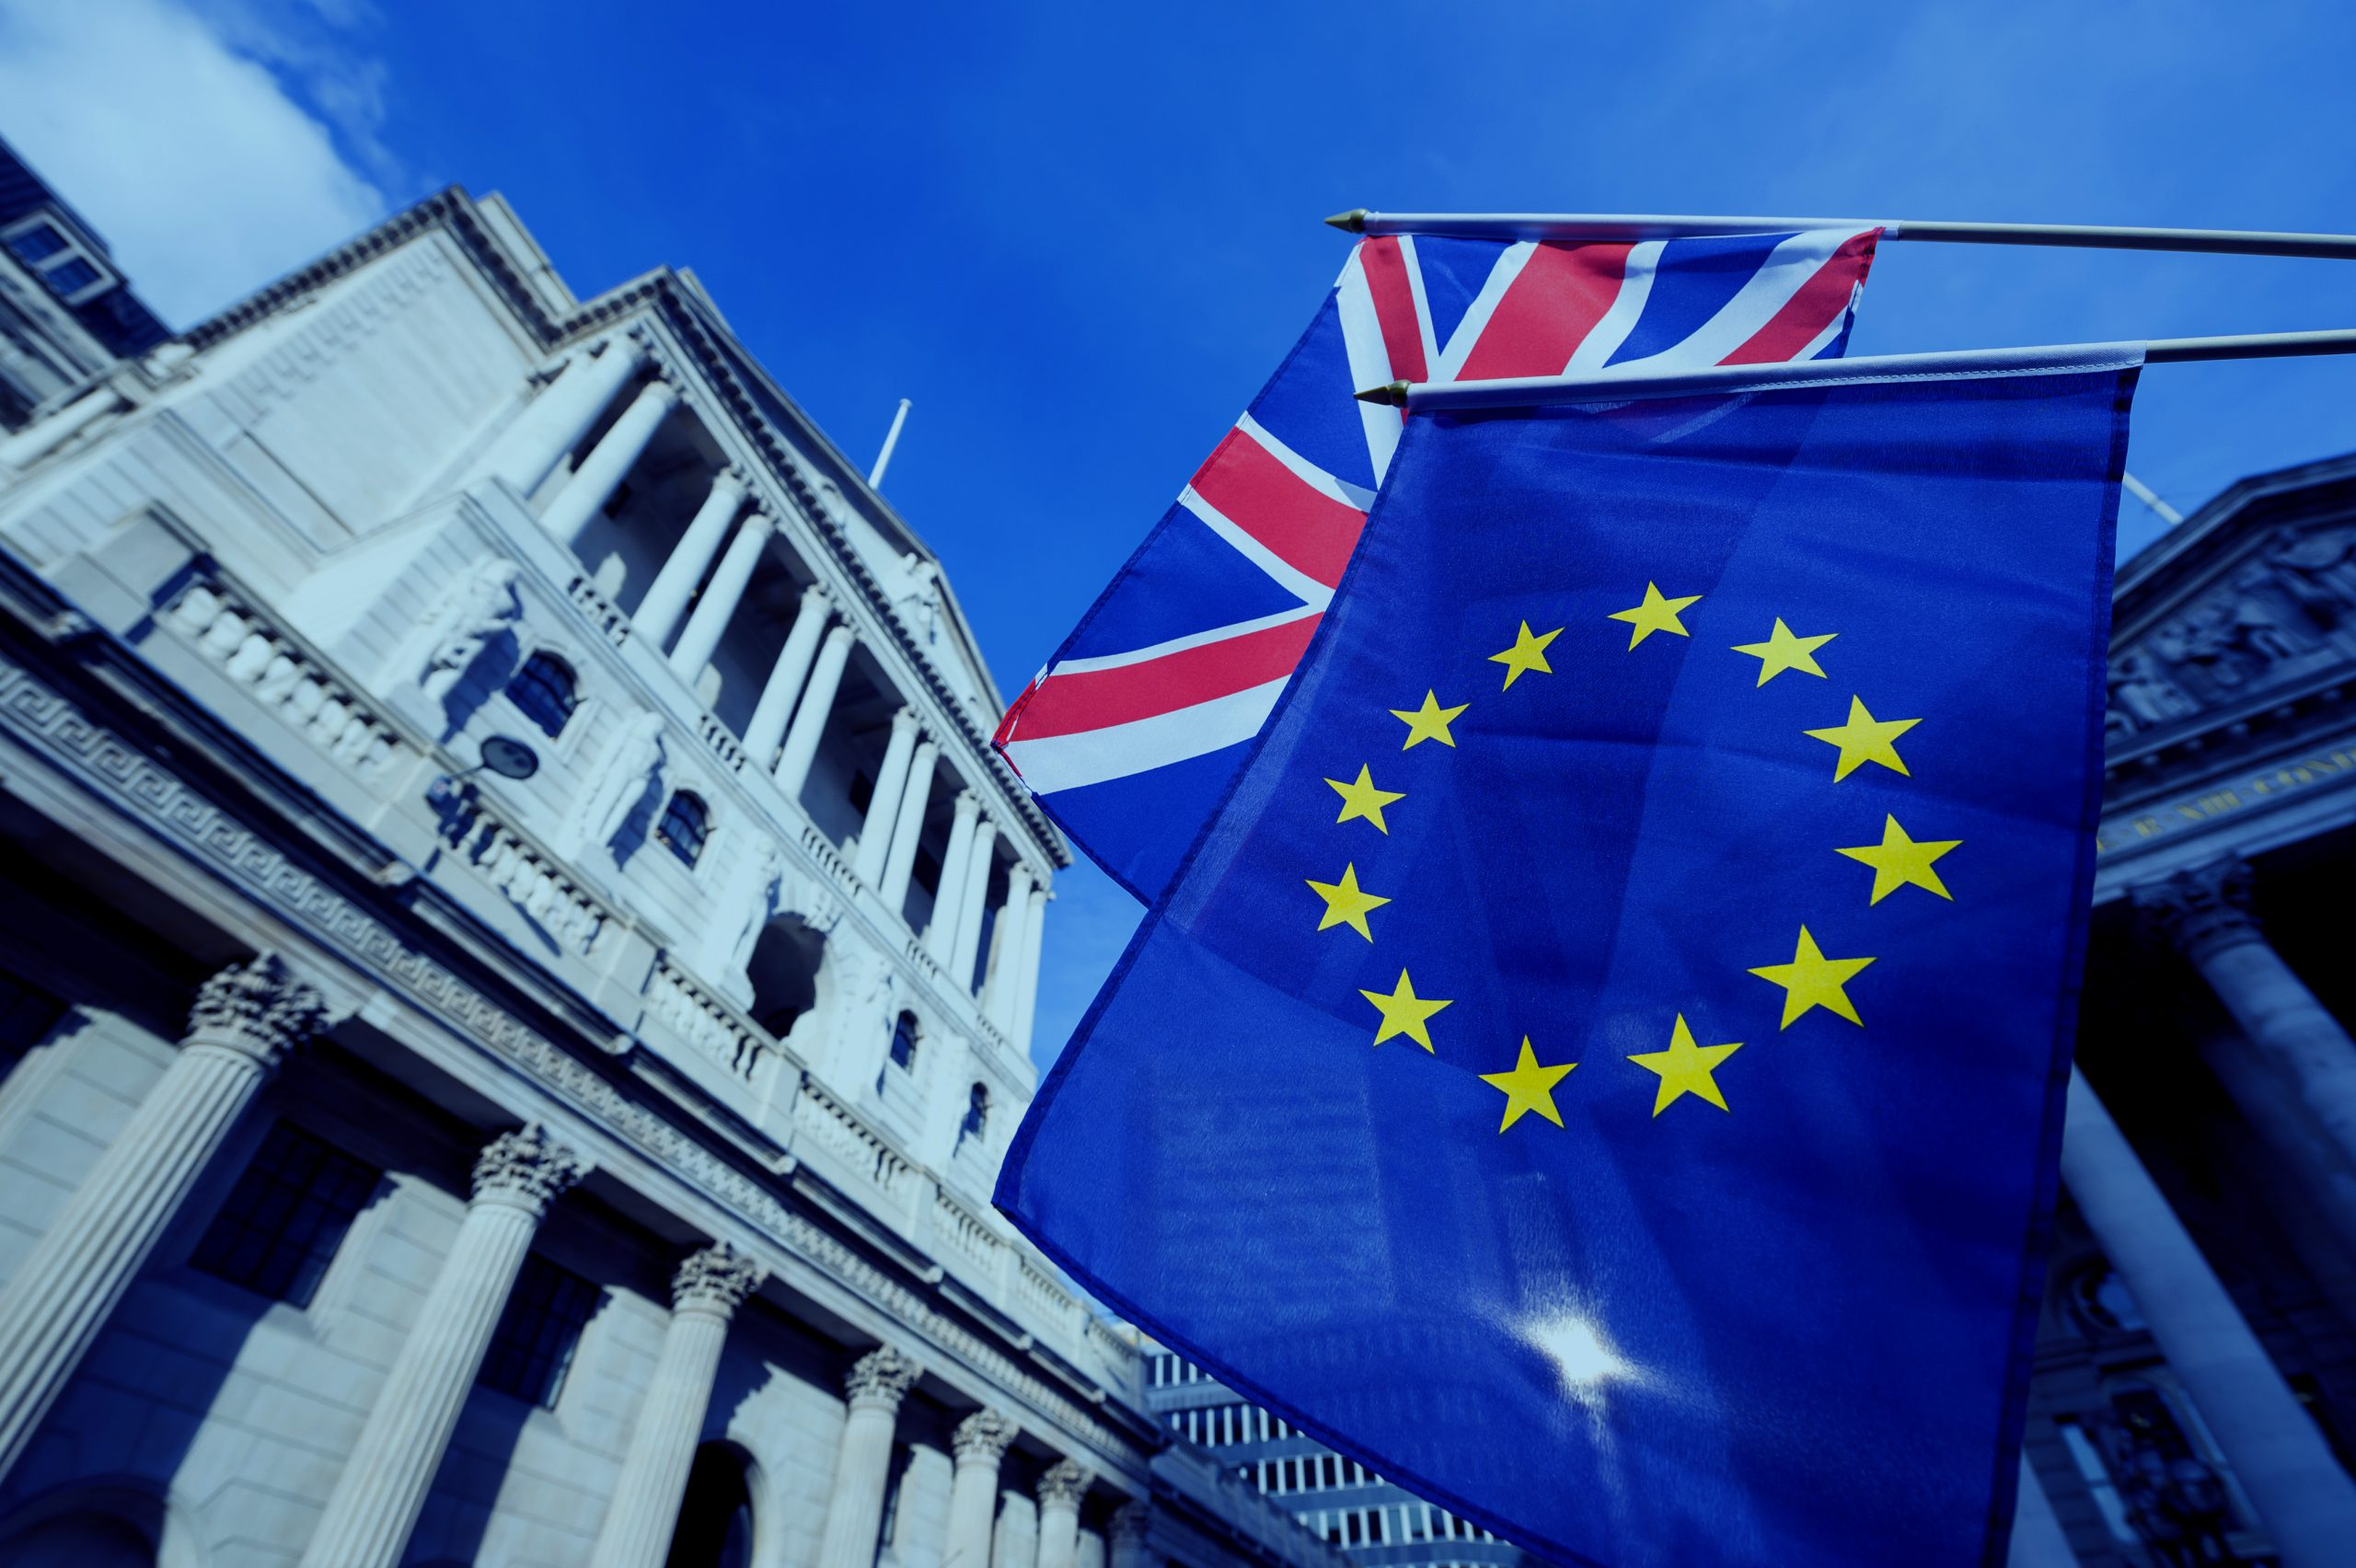 27/05 – Bank of England optimism helps sterling